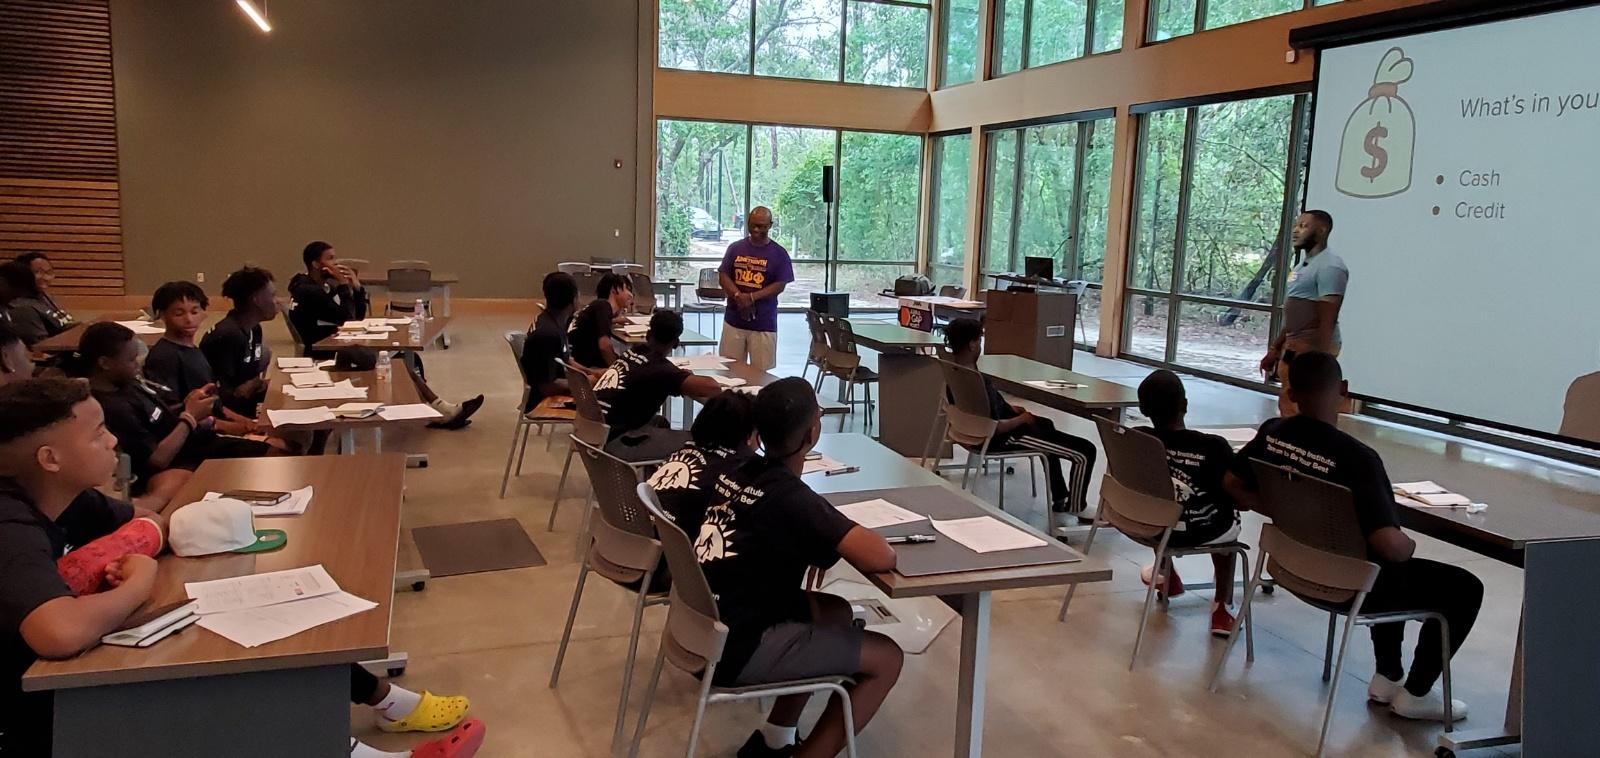 2021 Boys Leadership Institute - The Maynard 4 Foundation 05